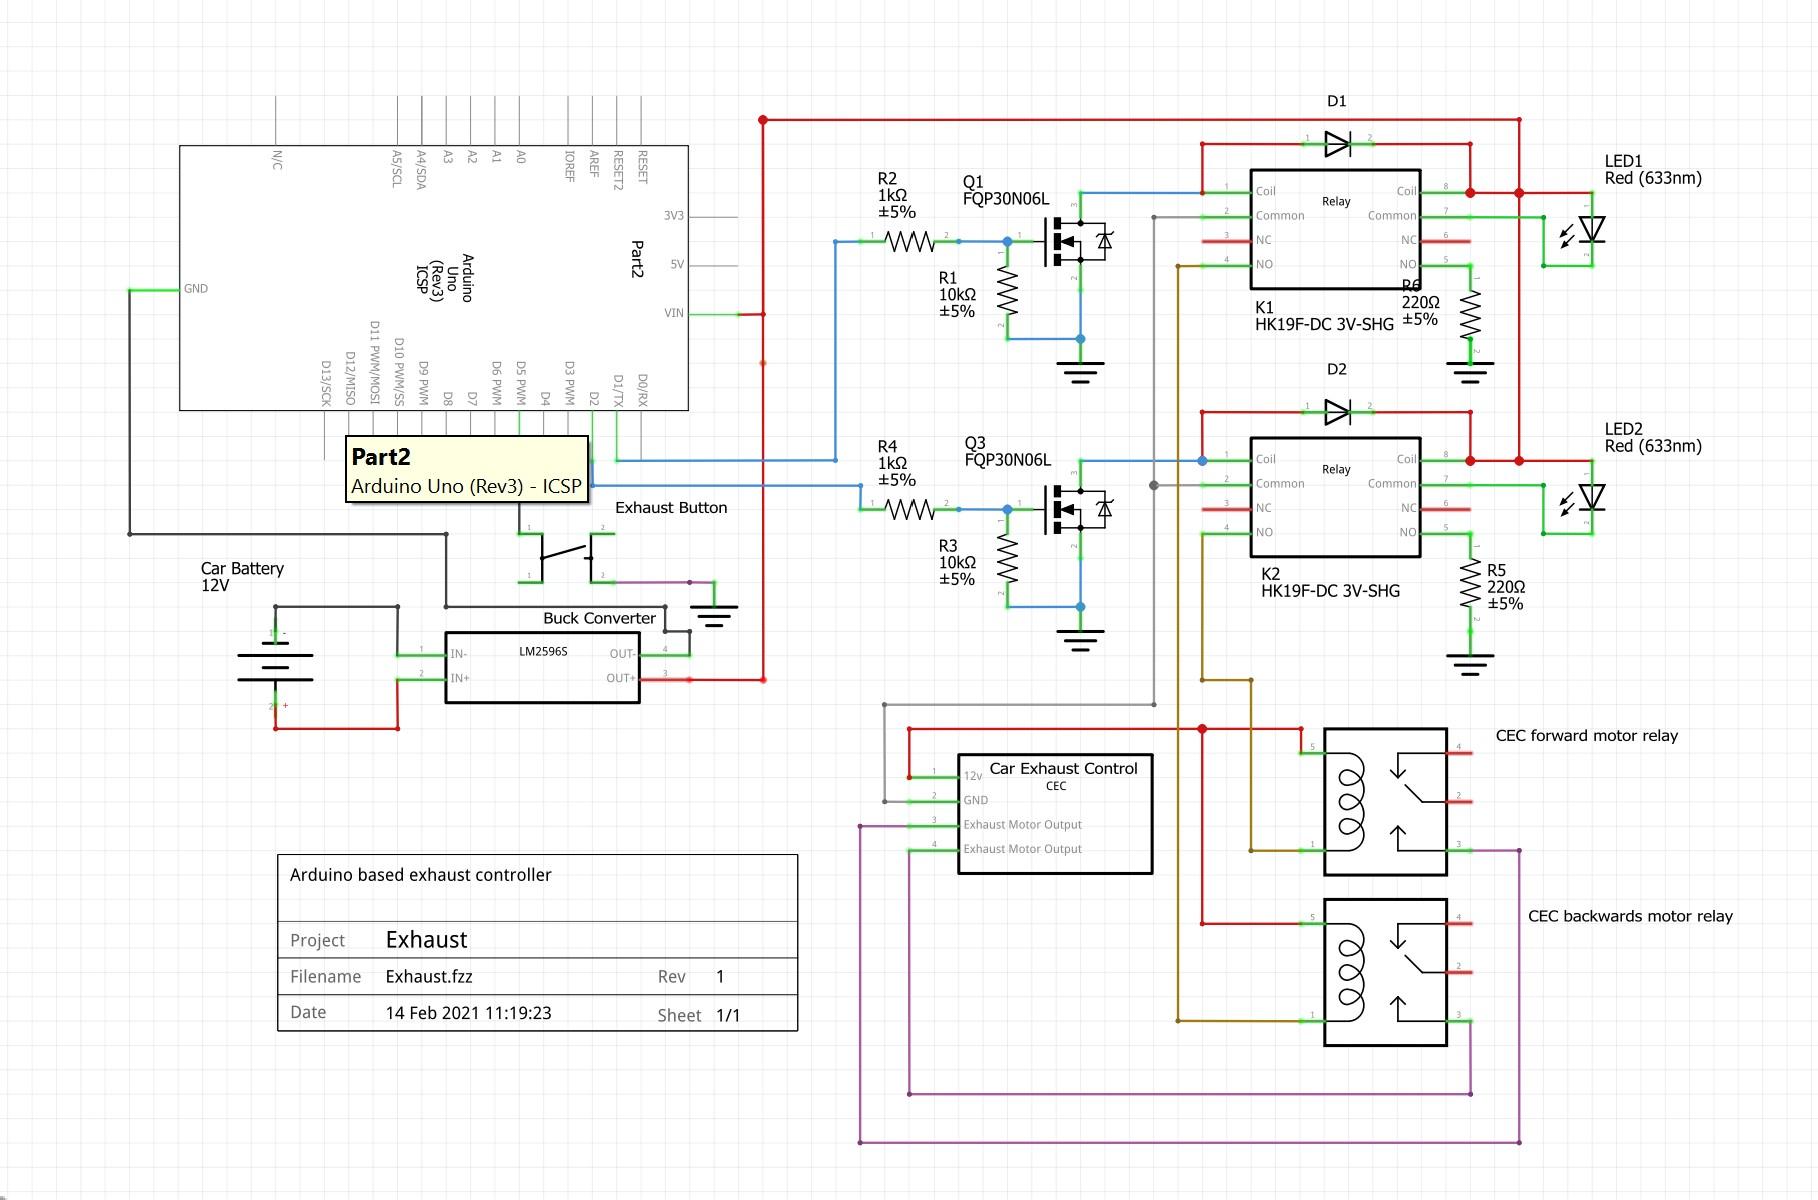 Exhaust uno schematic uxjkyrwifh